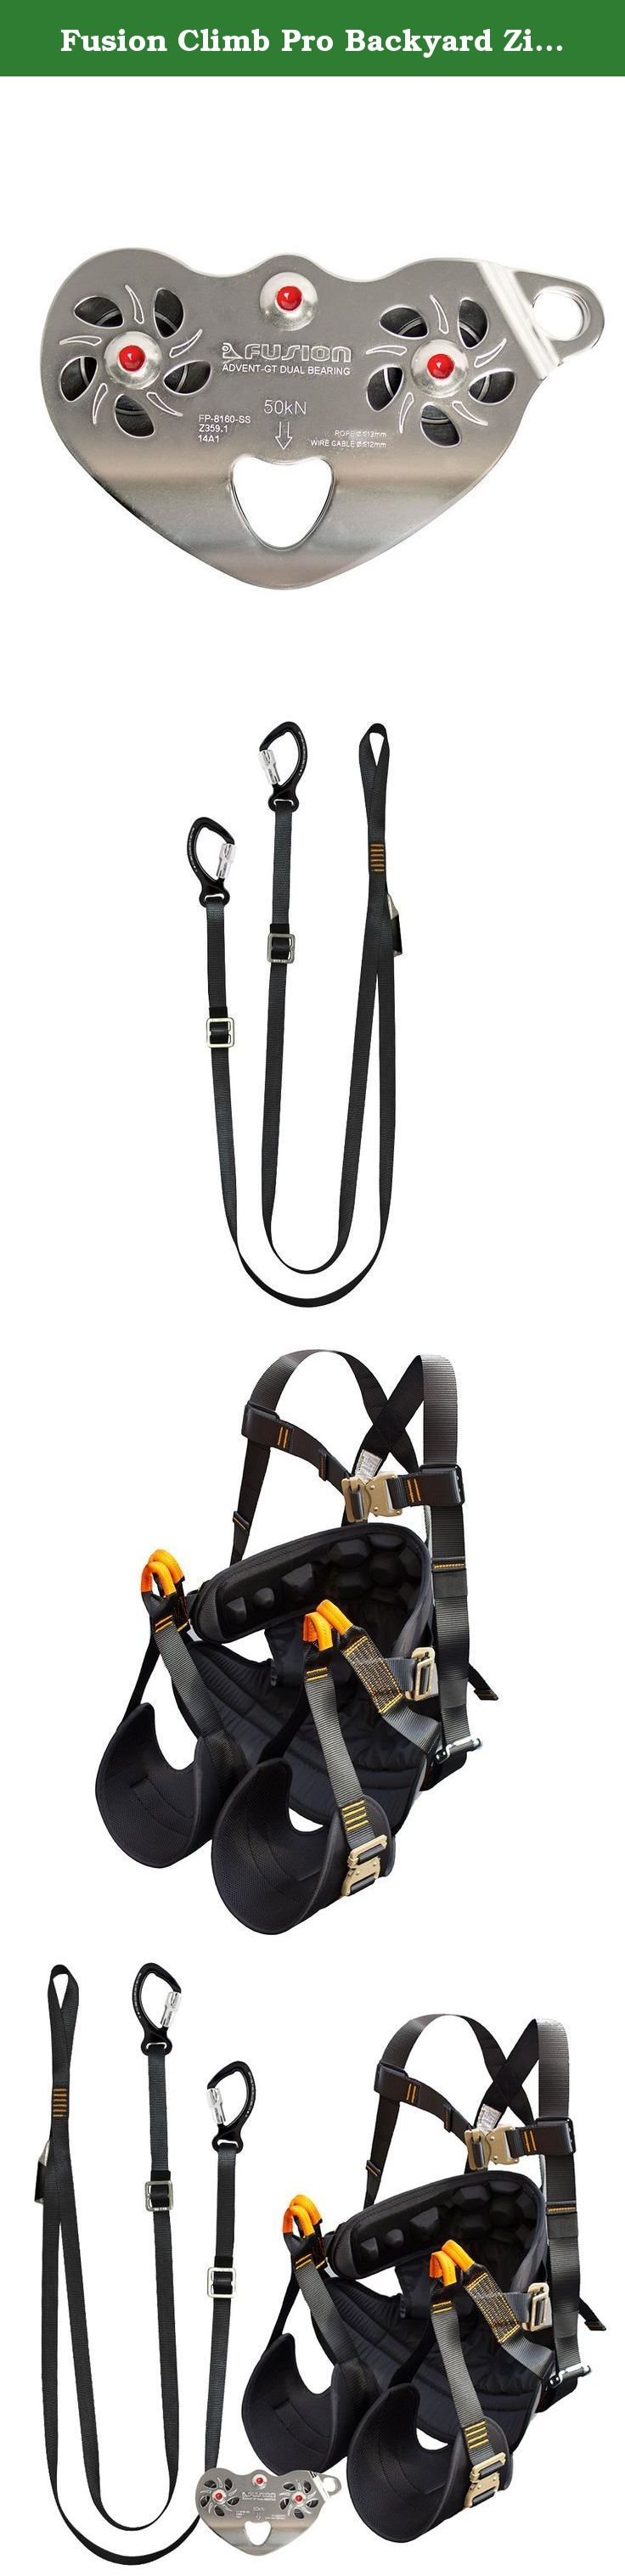 fusion climb pro backyard zip line kit fk a hlt 29 harness lanyard